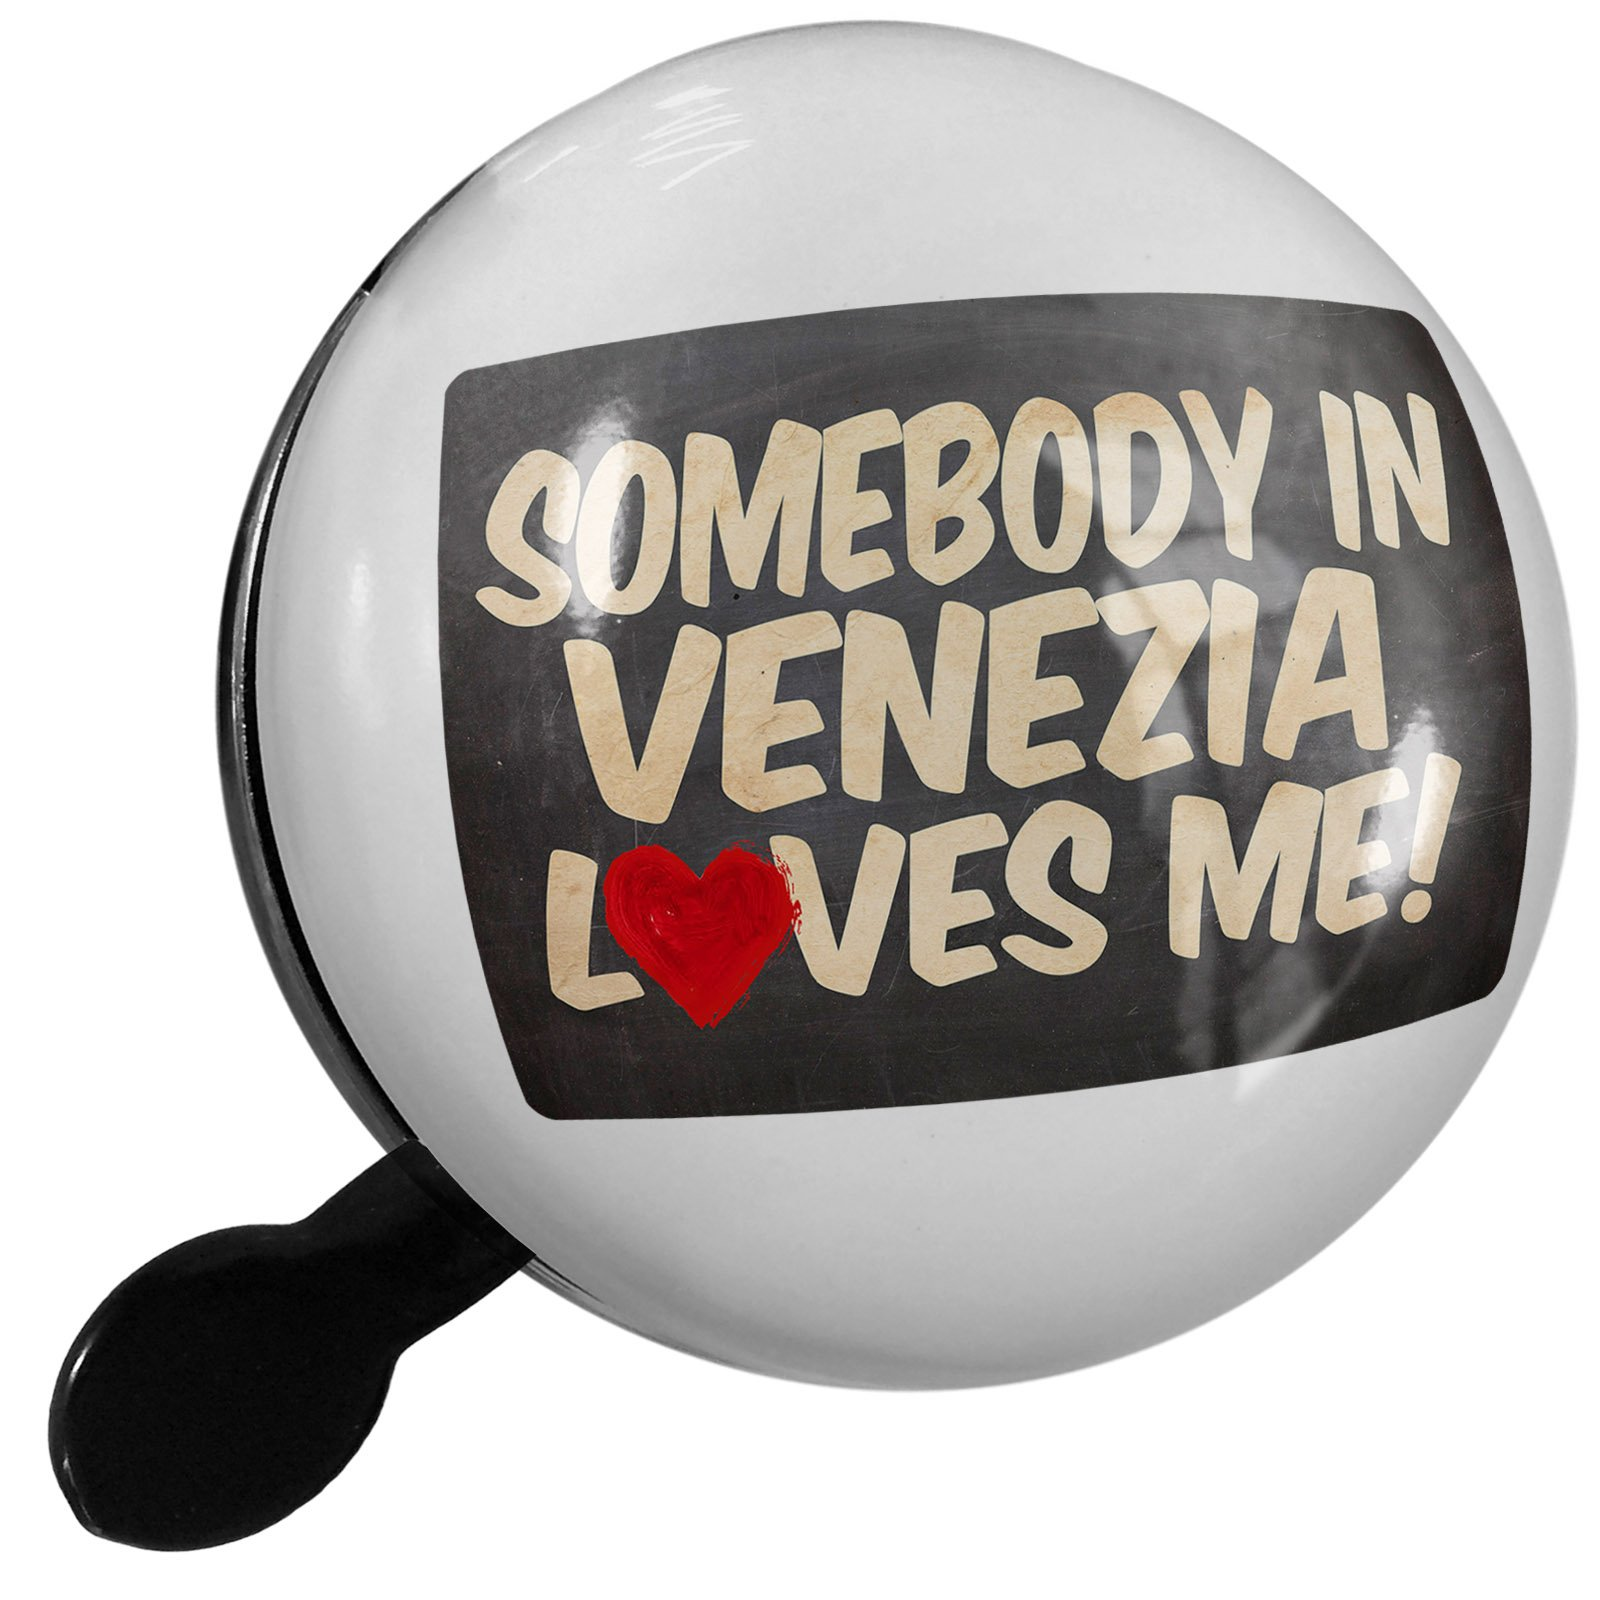 Small Bike Bell Somebody in Venezia Loves me, Italy - NEONBLOND